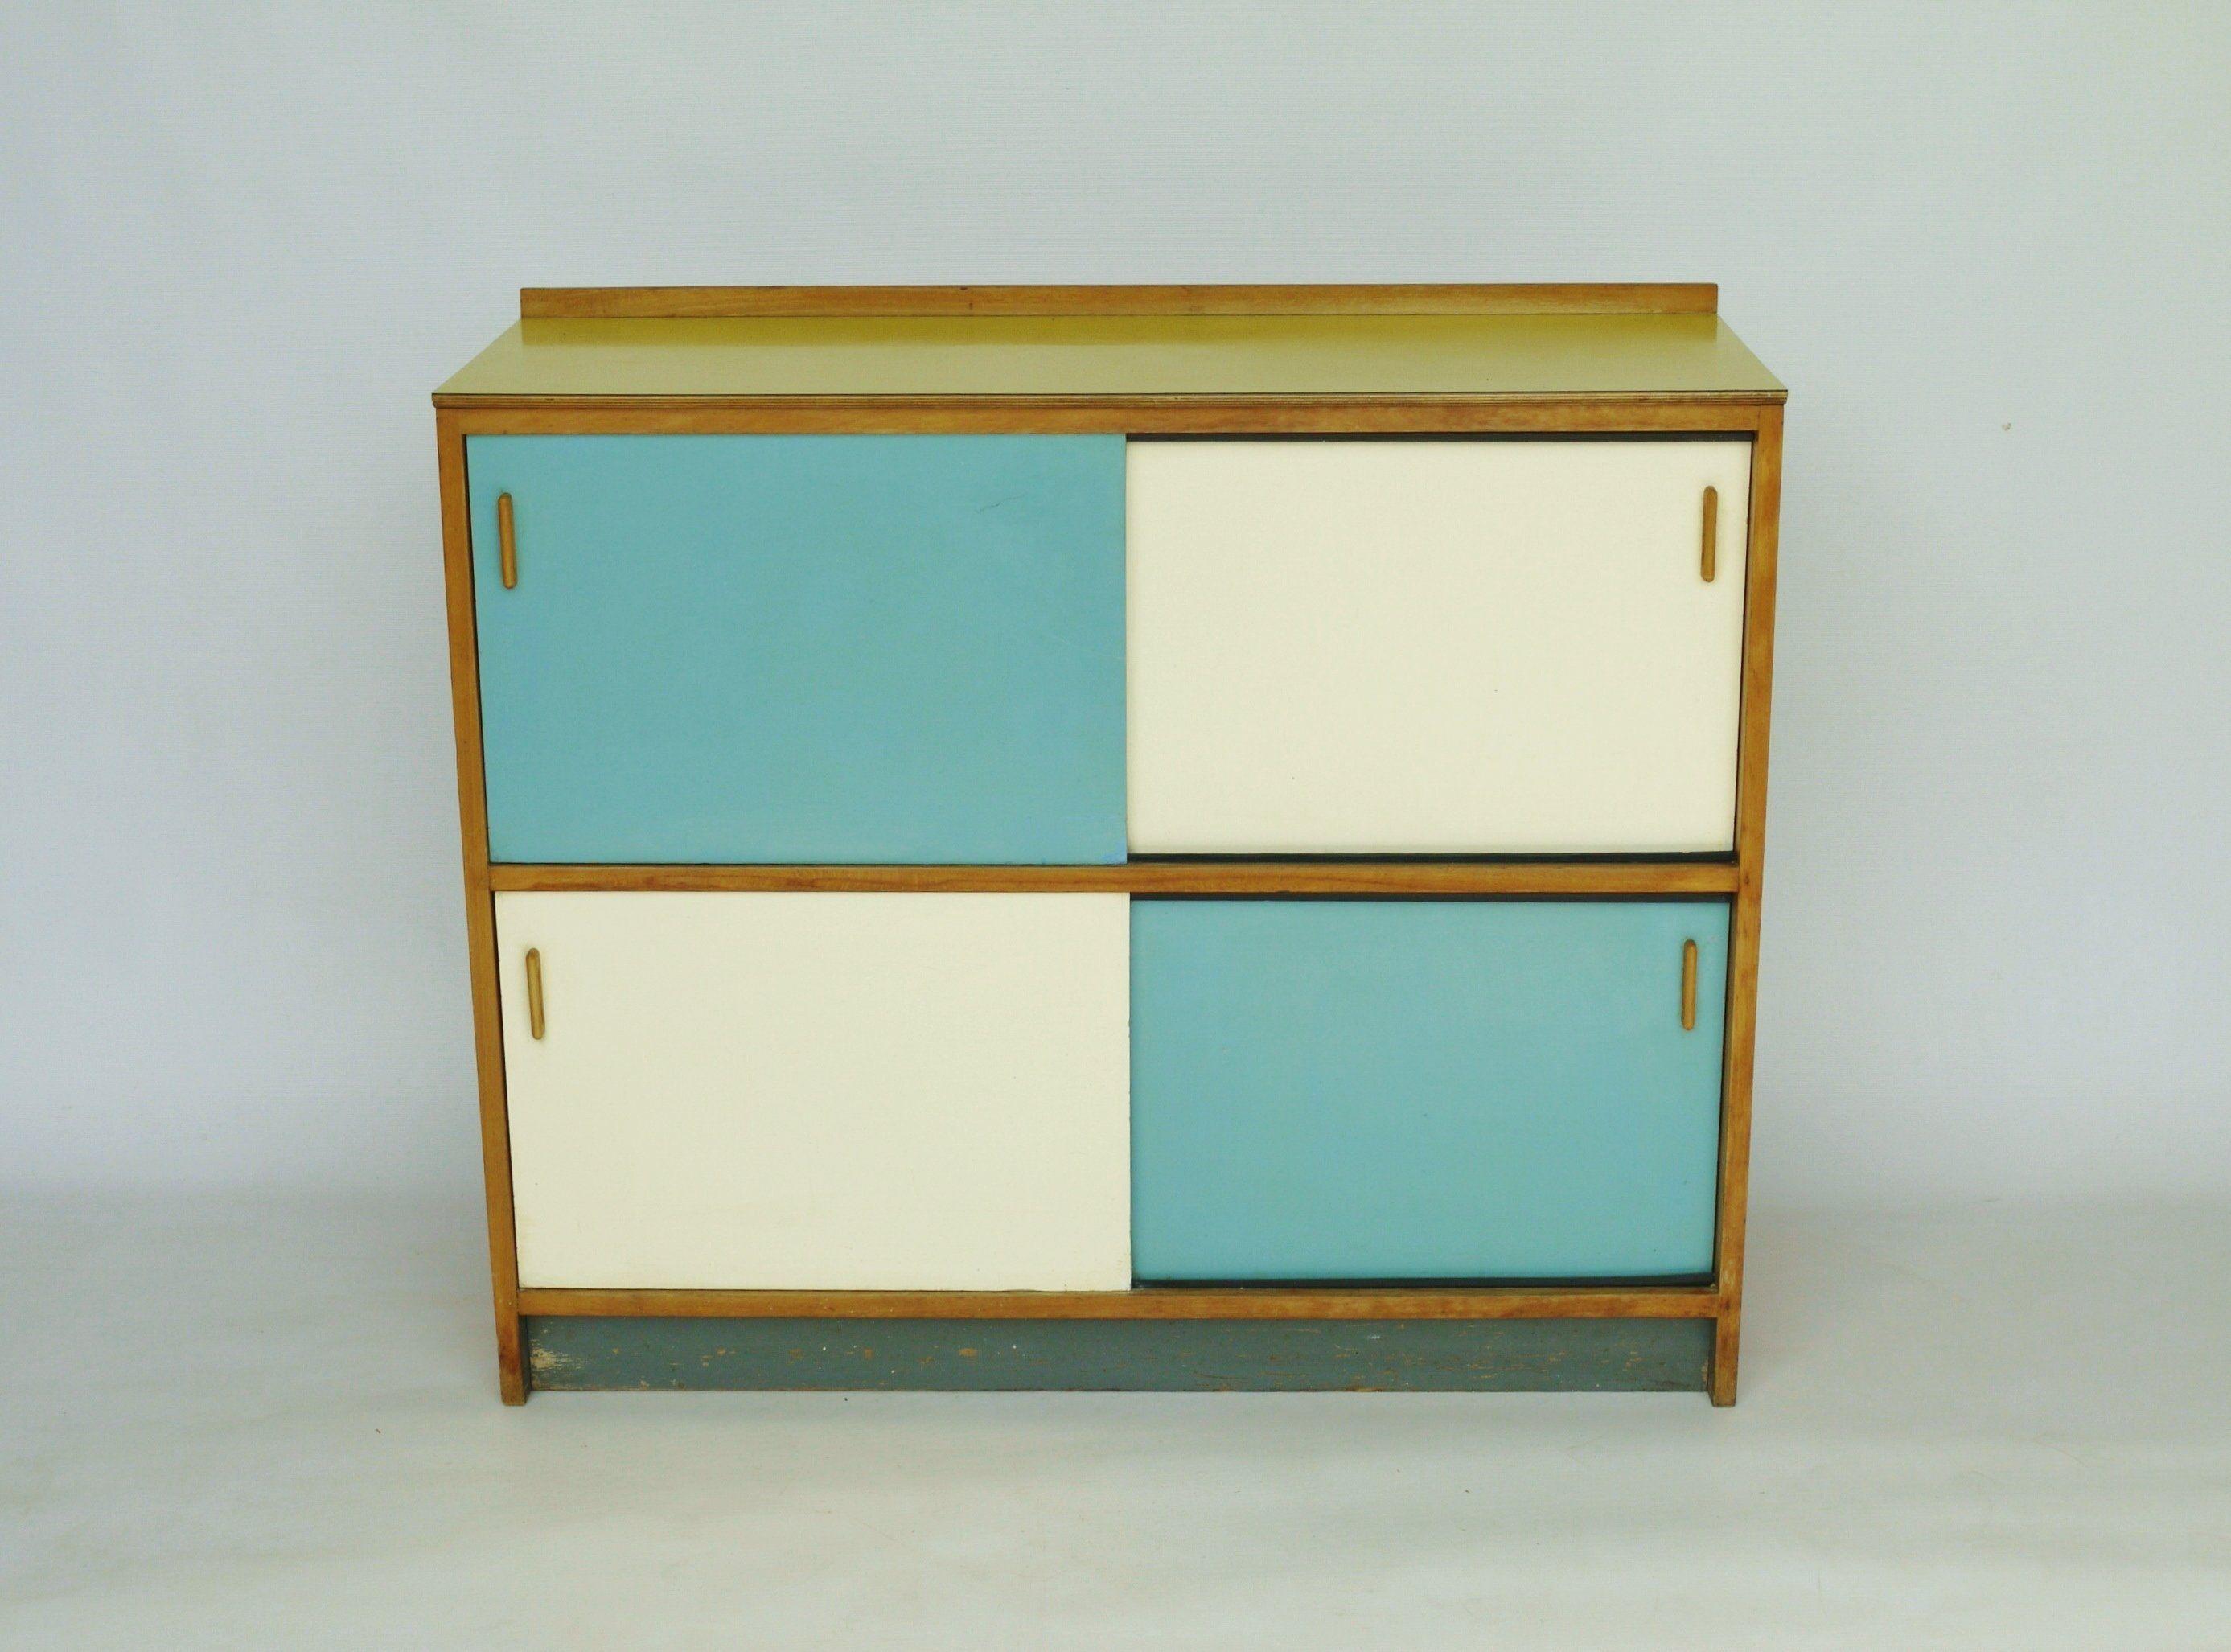 modernist Sideboard /cabinet by Frank Guille for sale at Deconet ...